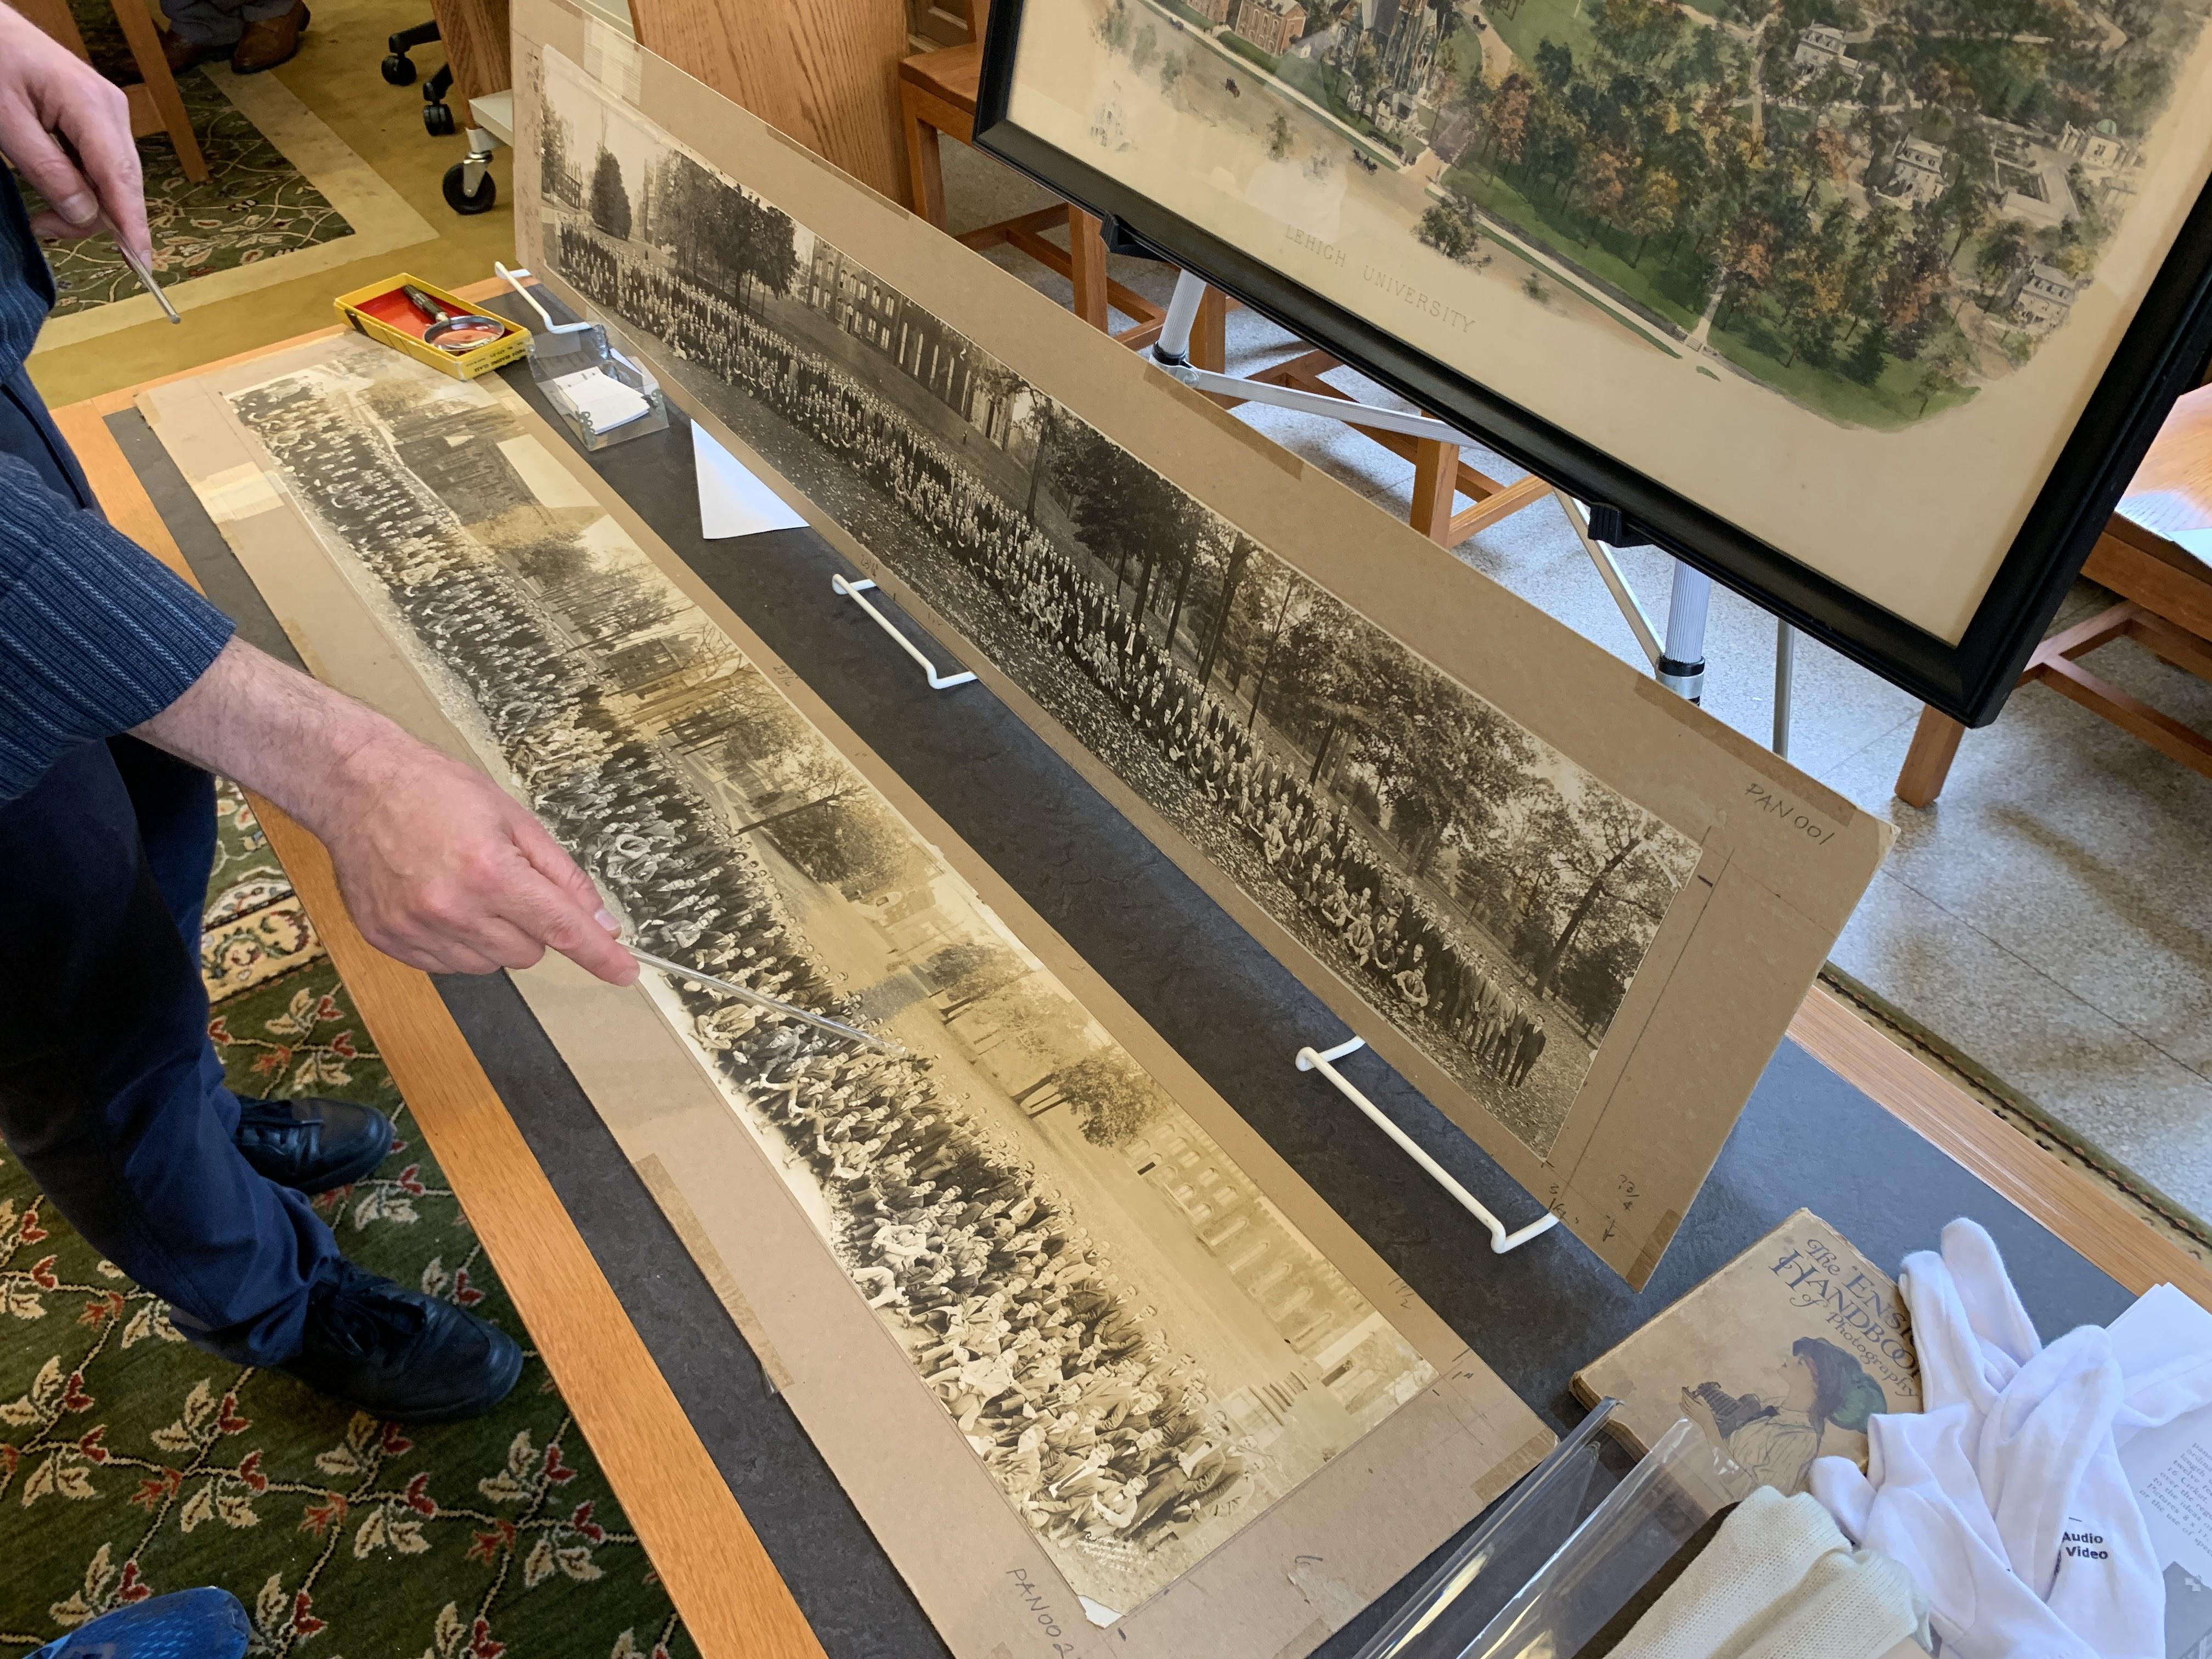 Ilhan Citak discussing early 1900s Lehigh panoramic photos